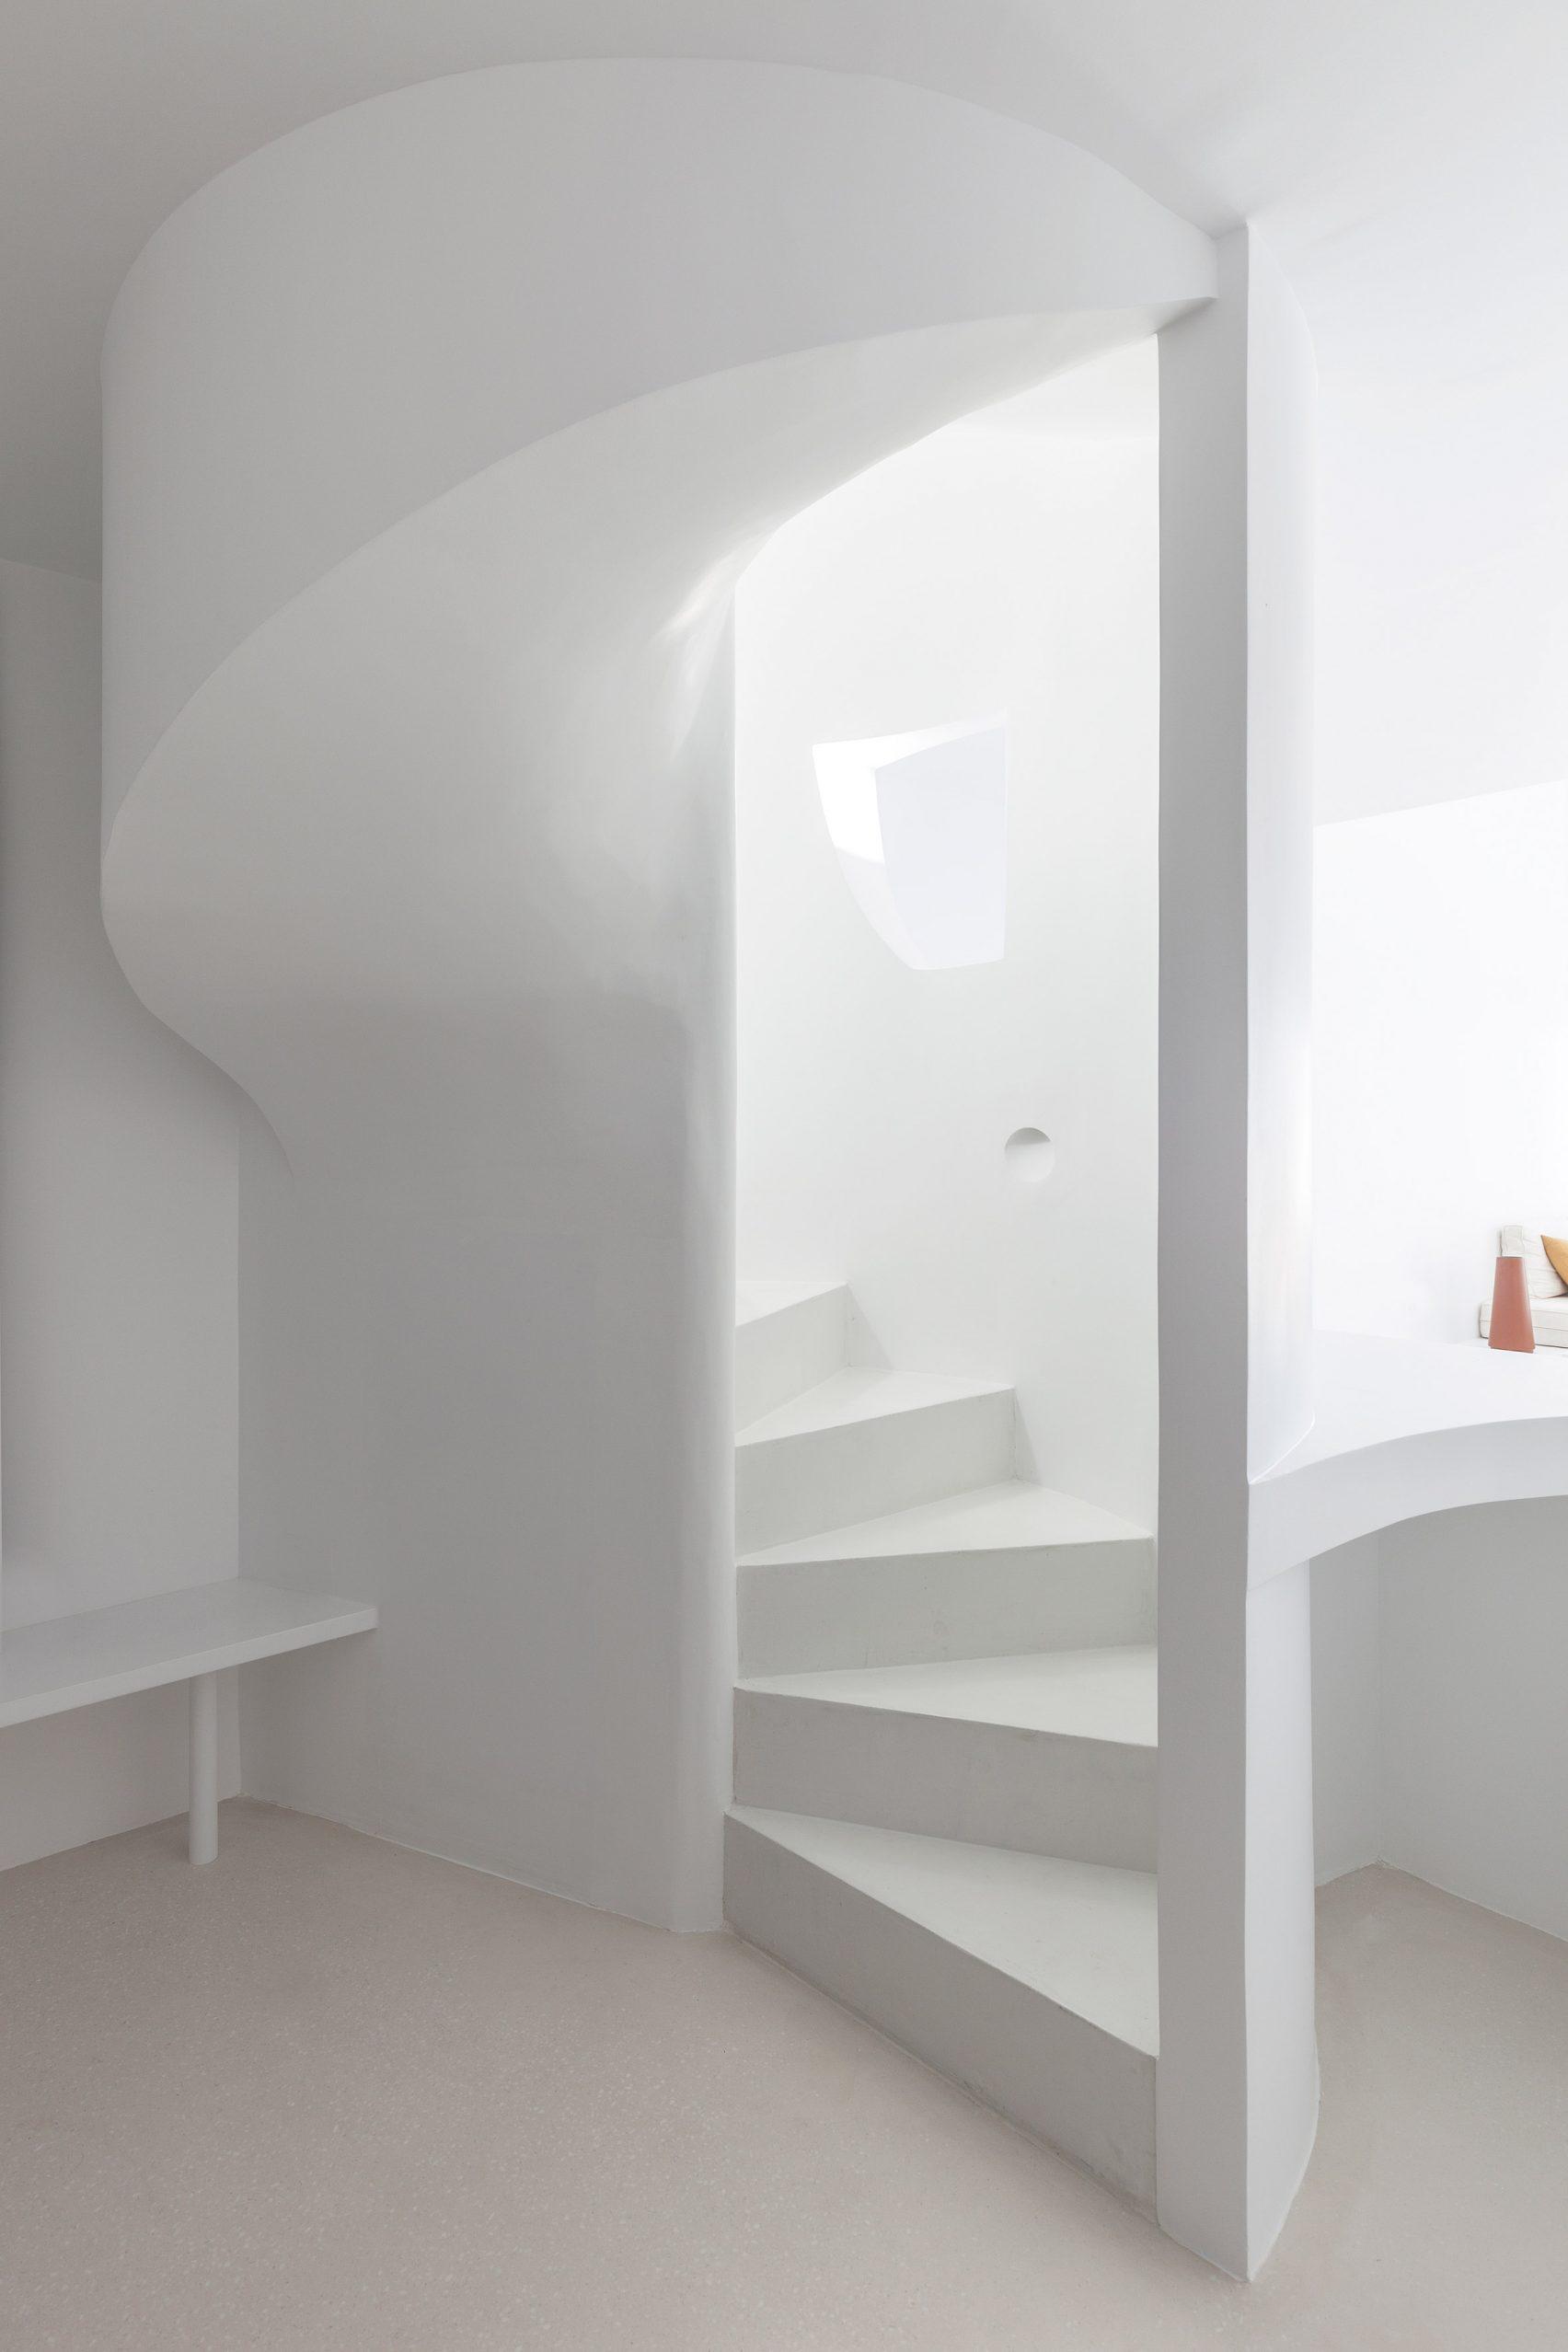 summer-residence-santorini-kapsimalis-architects-greece-architecture_dezeen_2364_col_24-1704x2556